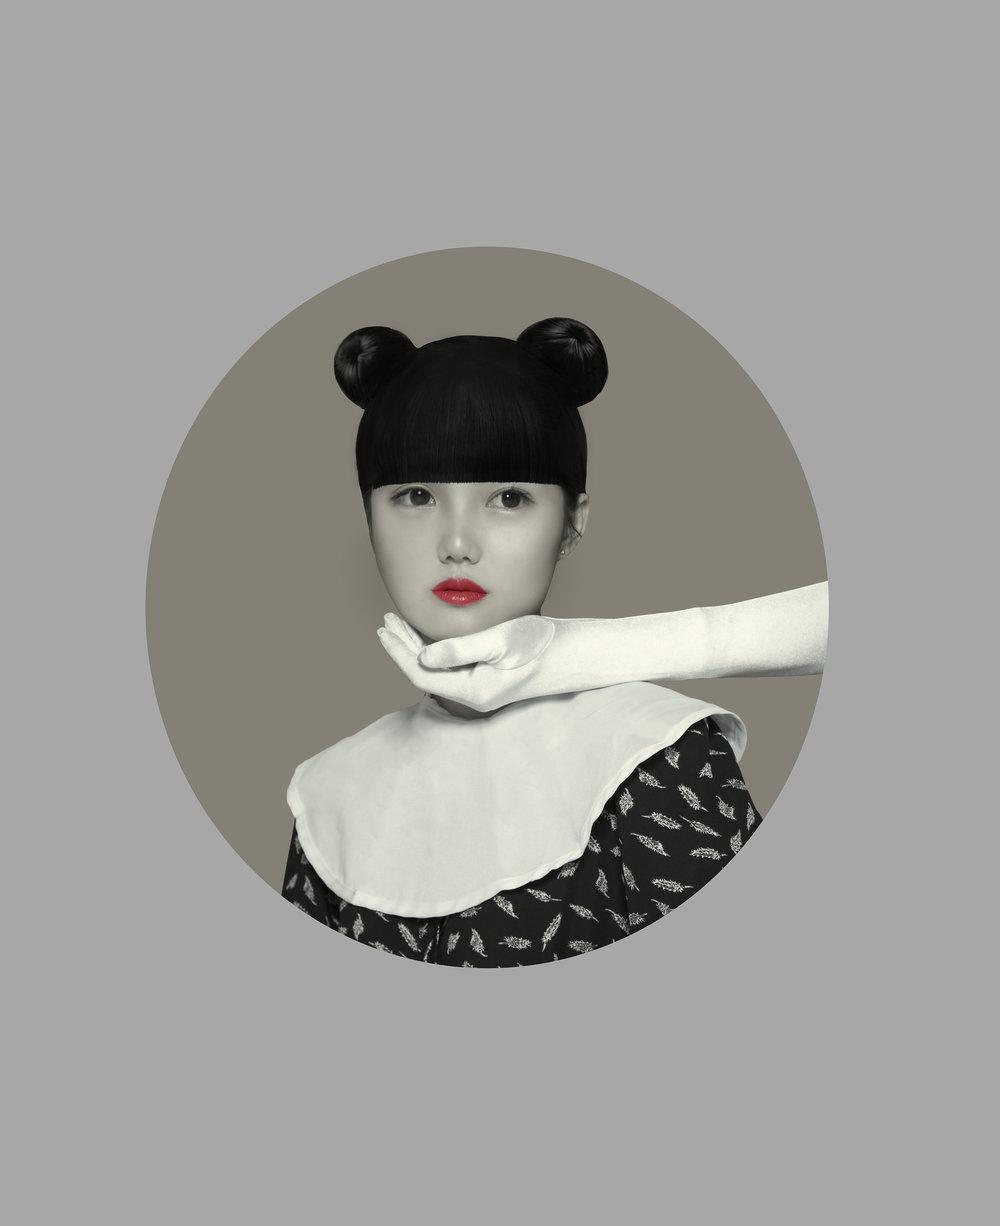 girl with red lips hailun ma.jpg